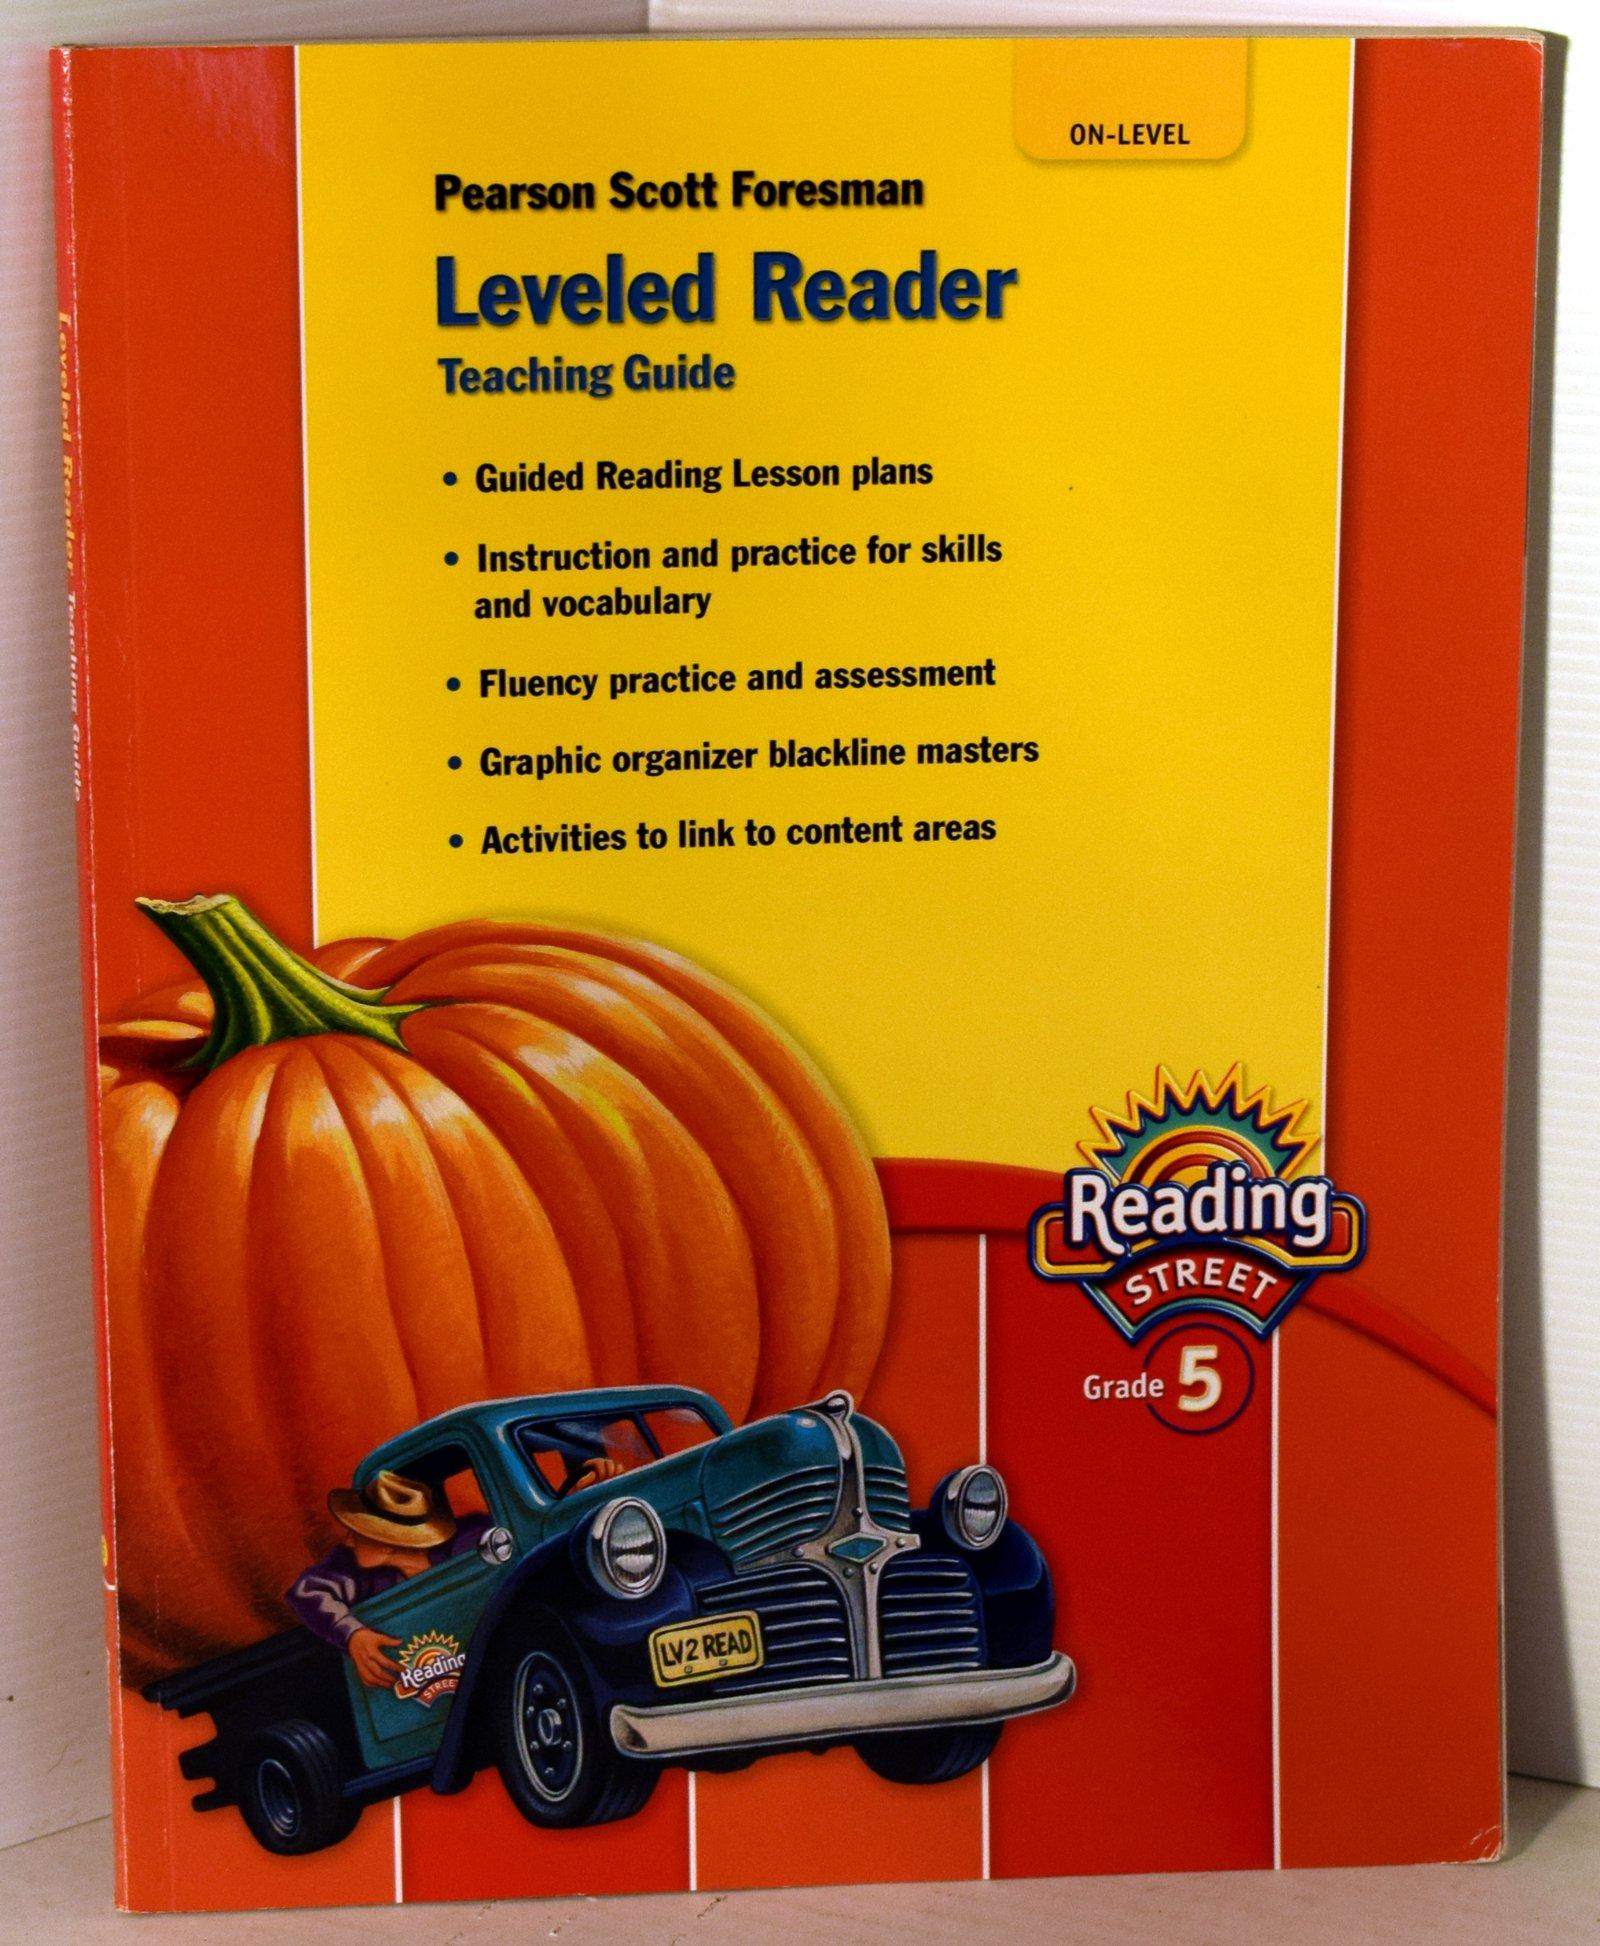 Pearson Scott Foresman Reading Street Grade 5 Leveled Reader Teaching Guide  (On-Level): Pearson Scott Foresman: 9780328484447: Amazon.com: Books